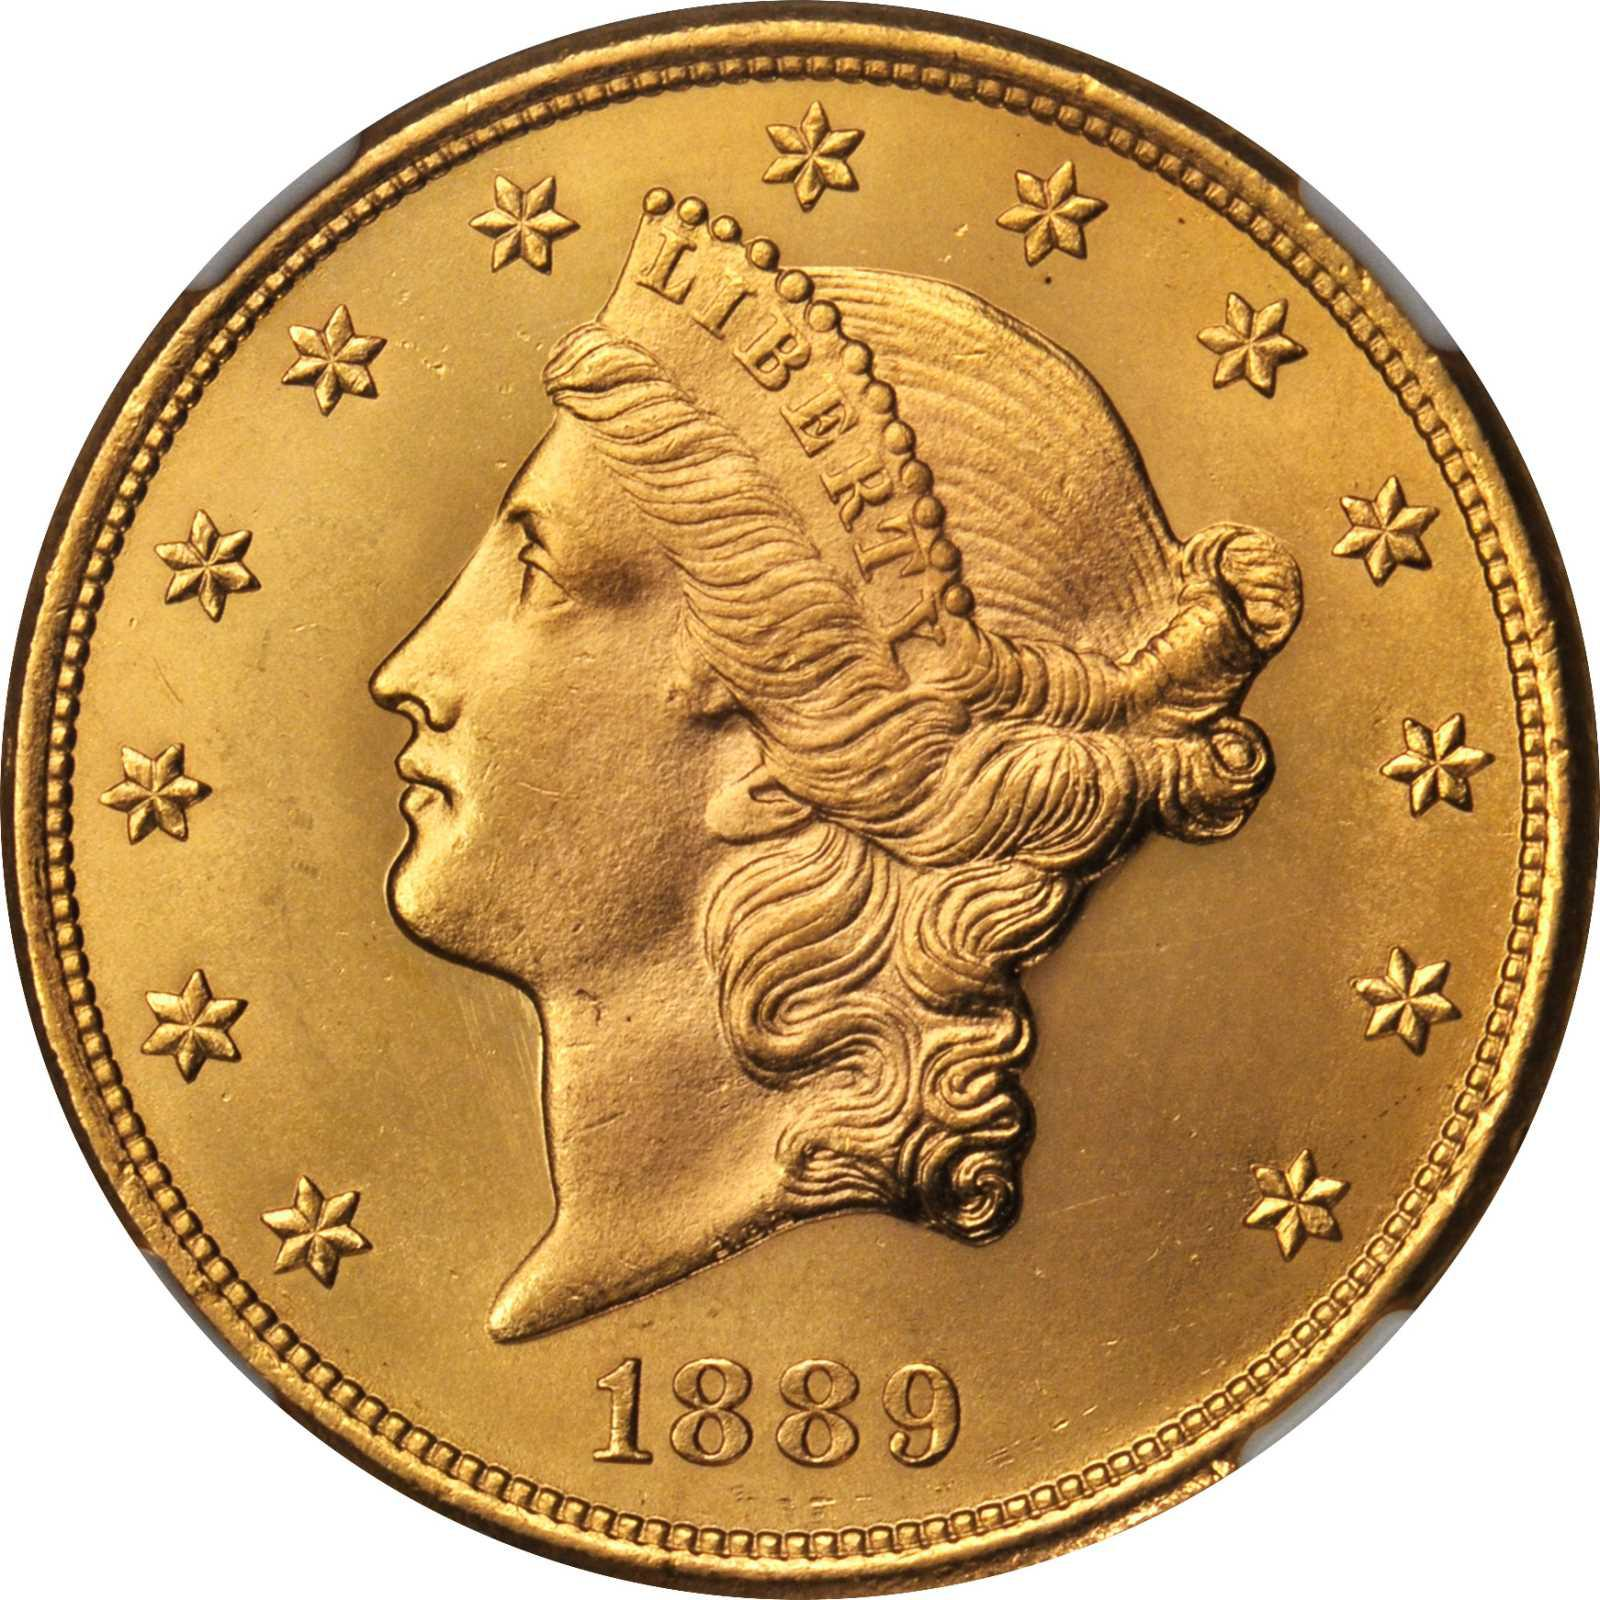 hartmans rare coins & bullion